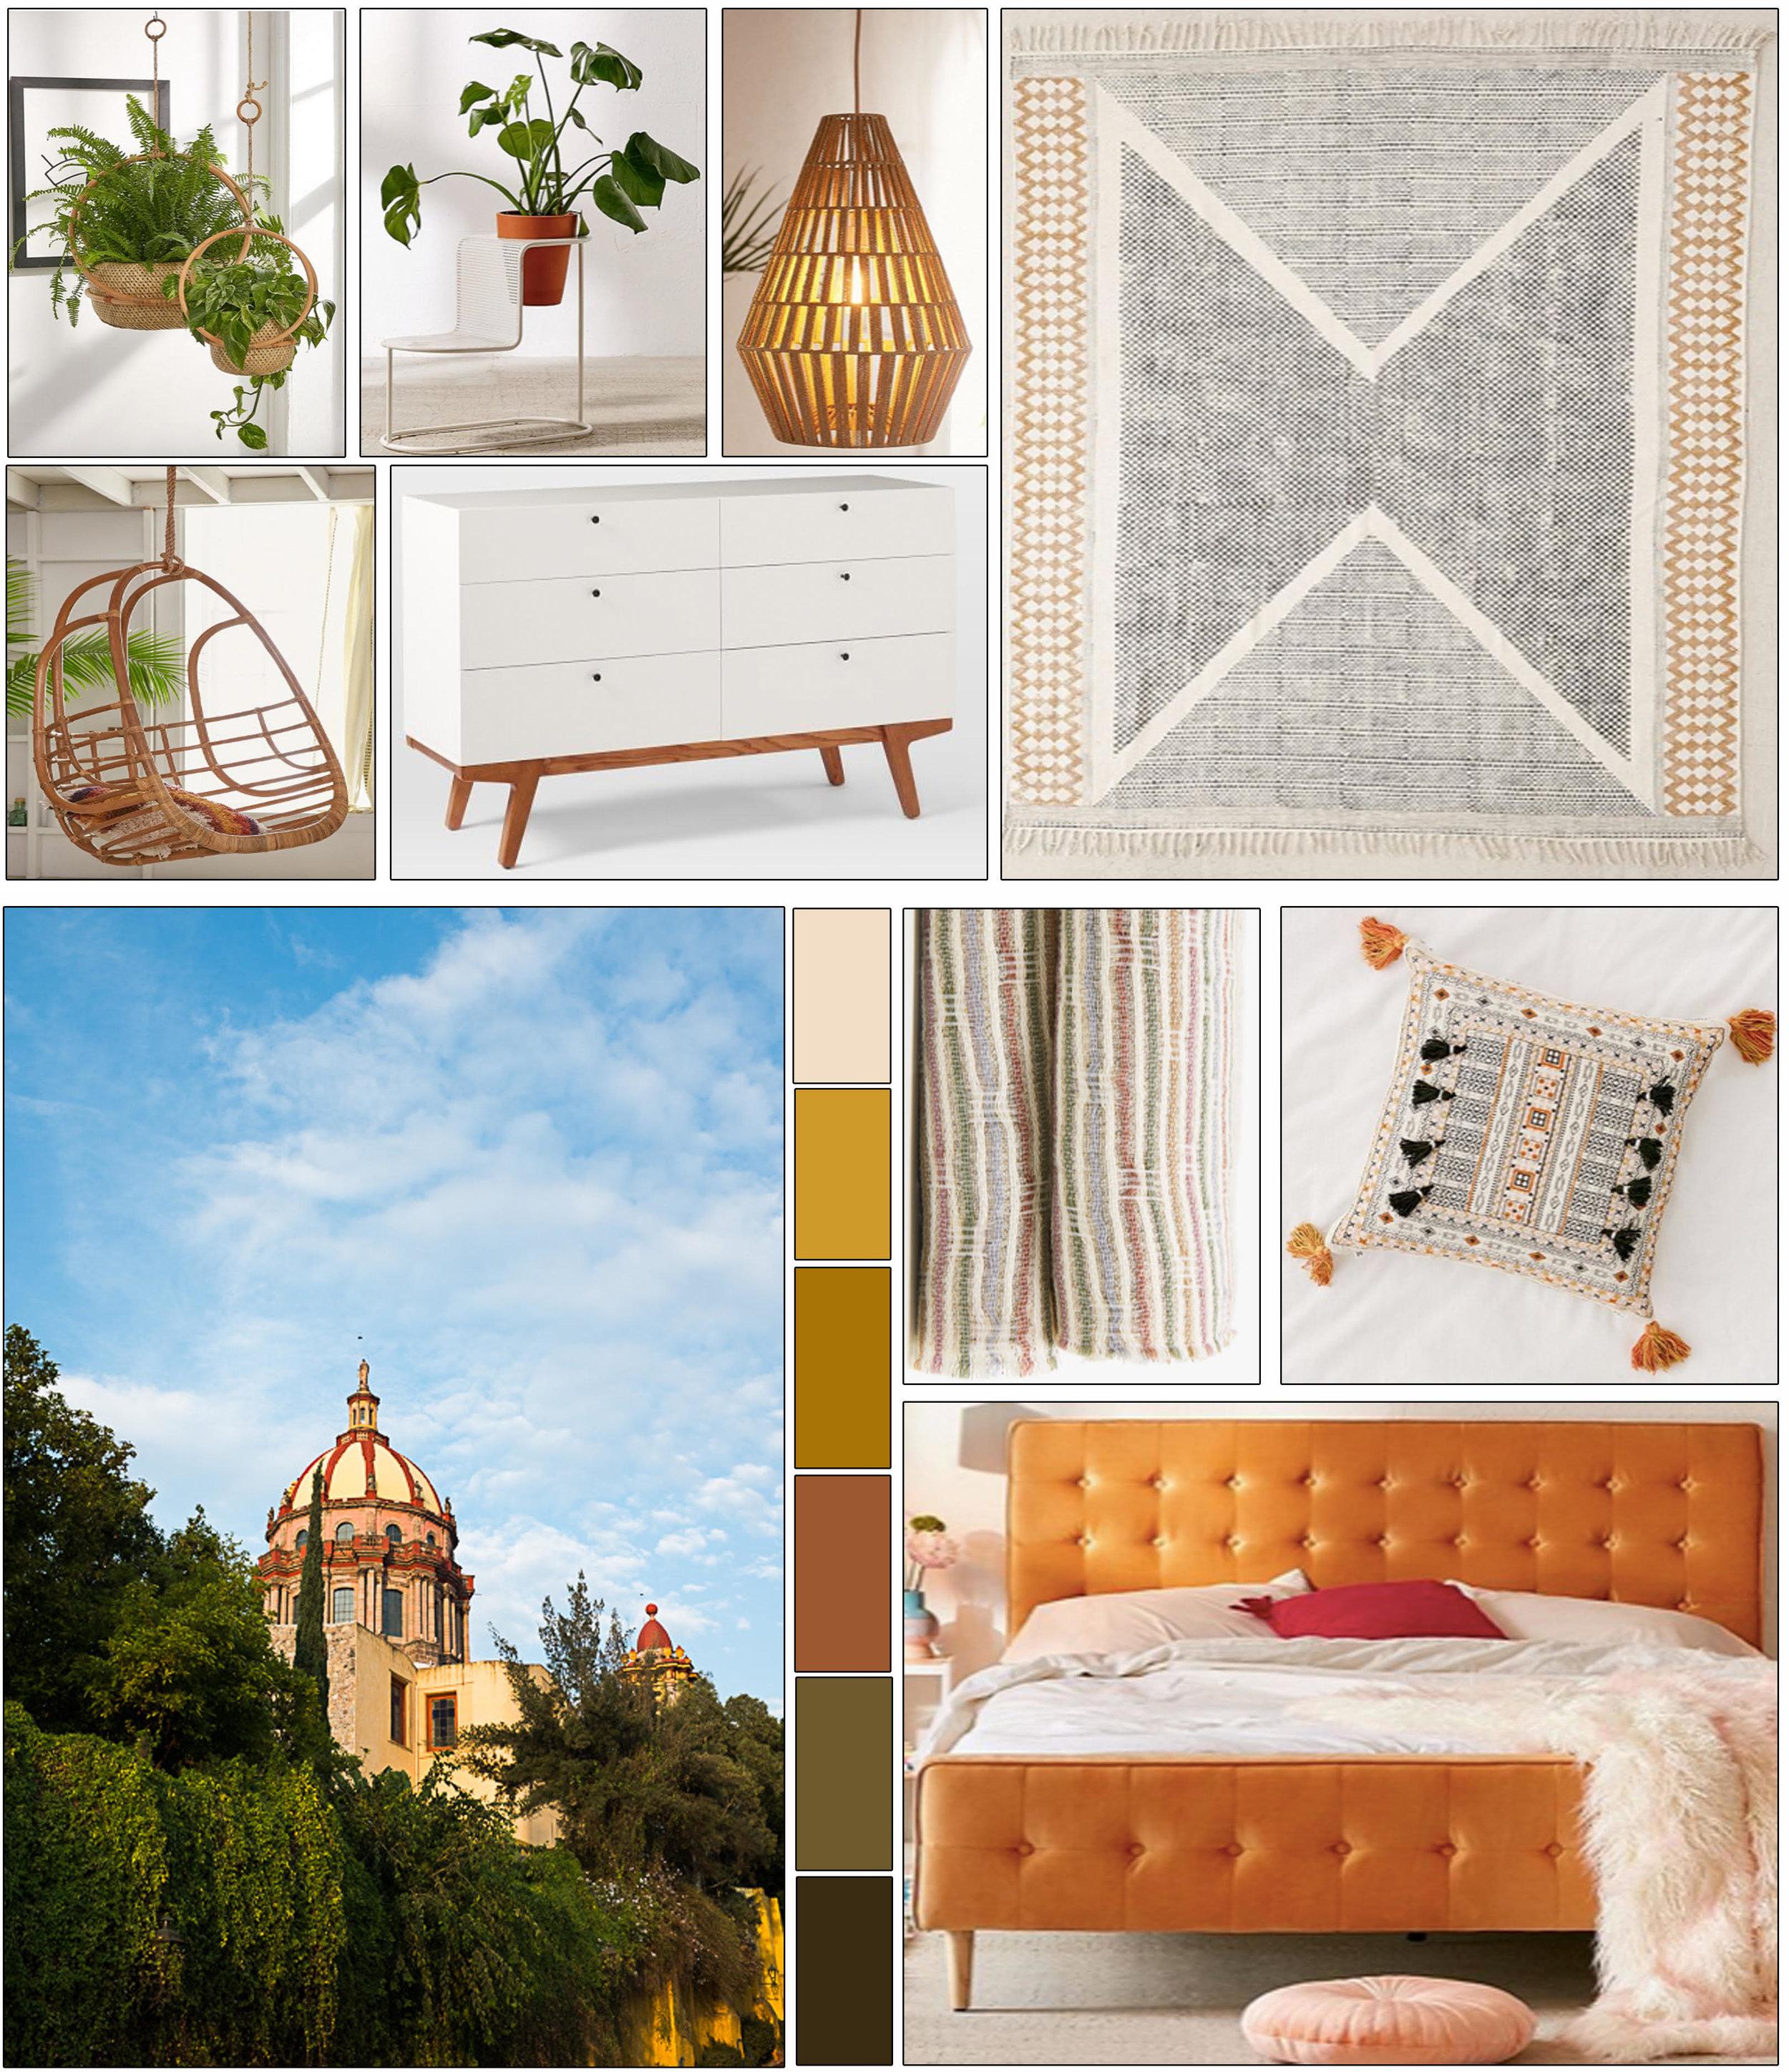 mexico-church-print-moodboard-home-art-decor-karinamoraprints-1.jpg